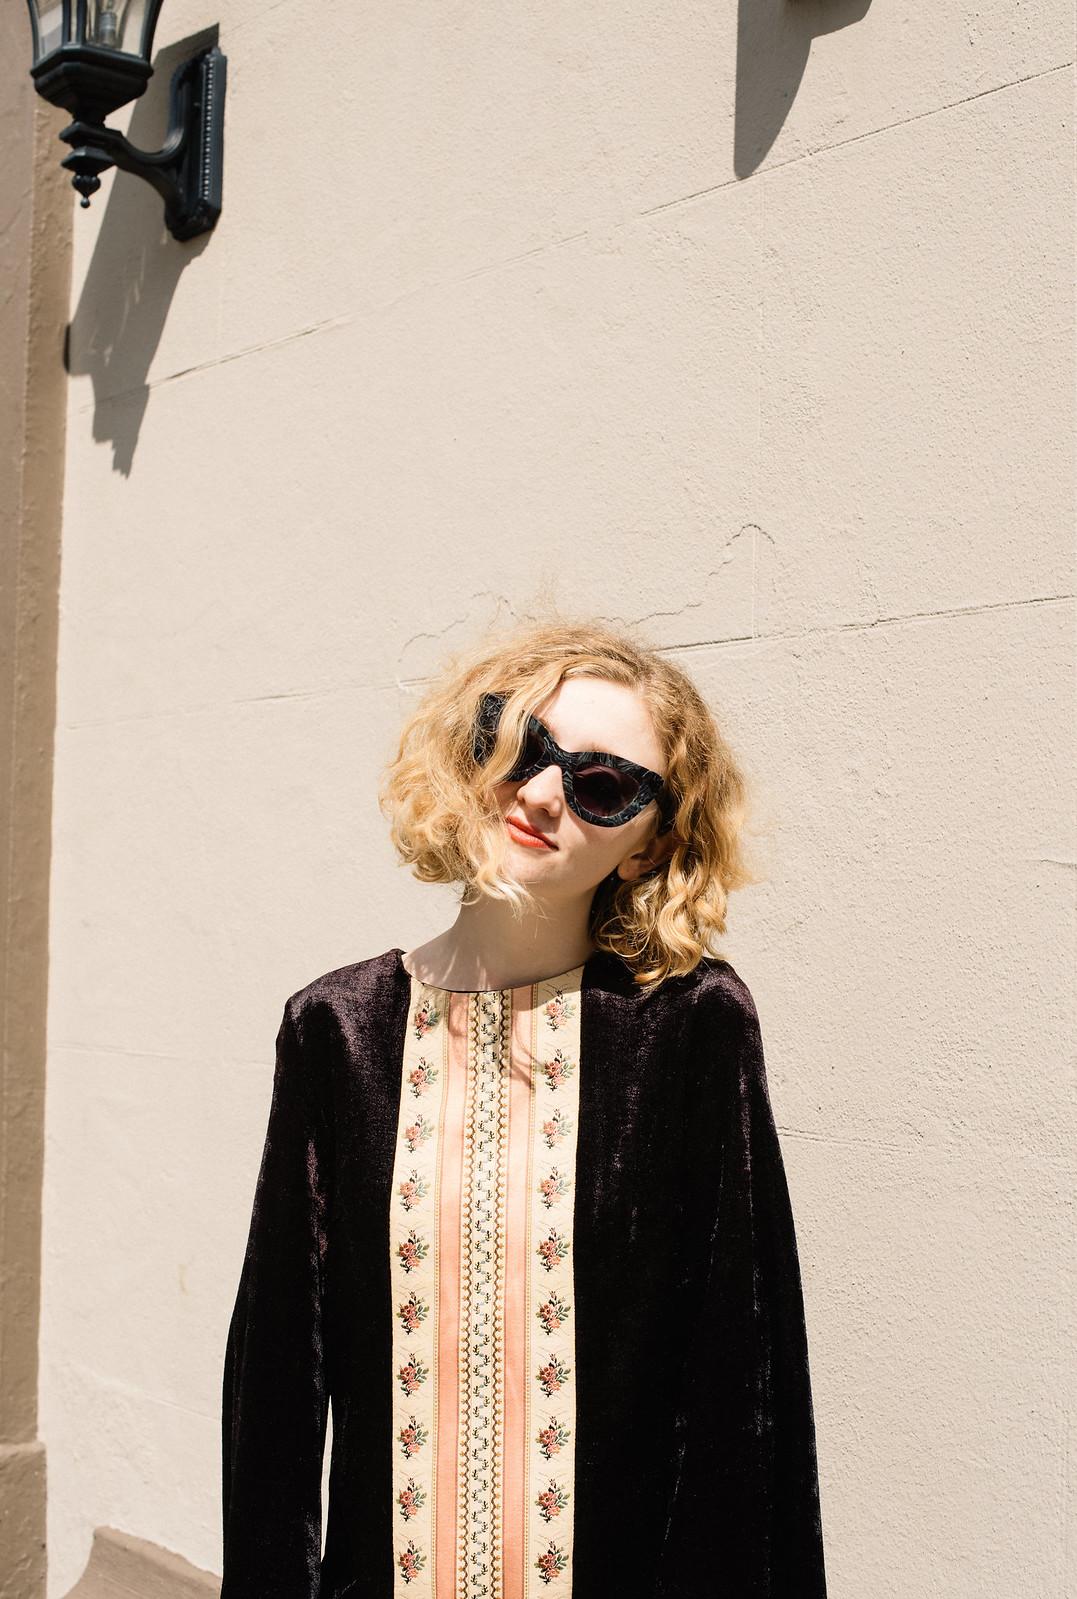 Vintage Style from Oonas shot by Lauren O'Neil on juliettelaura.blogspot.com